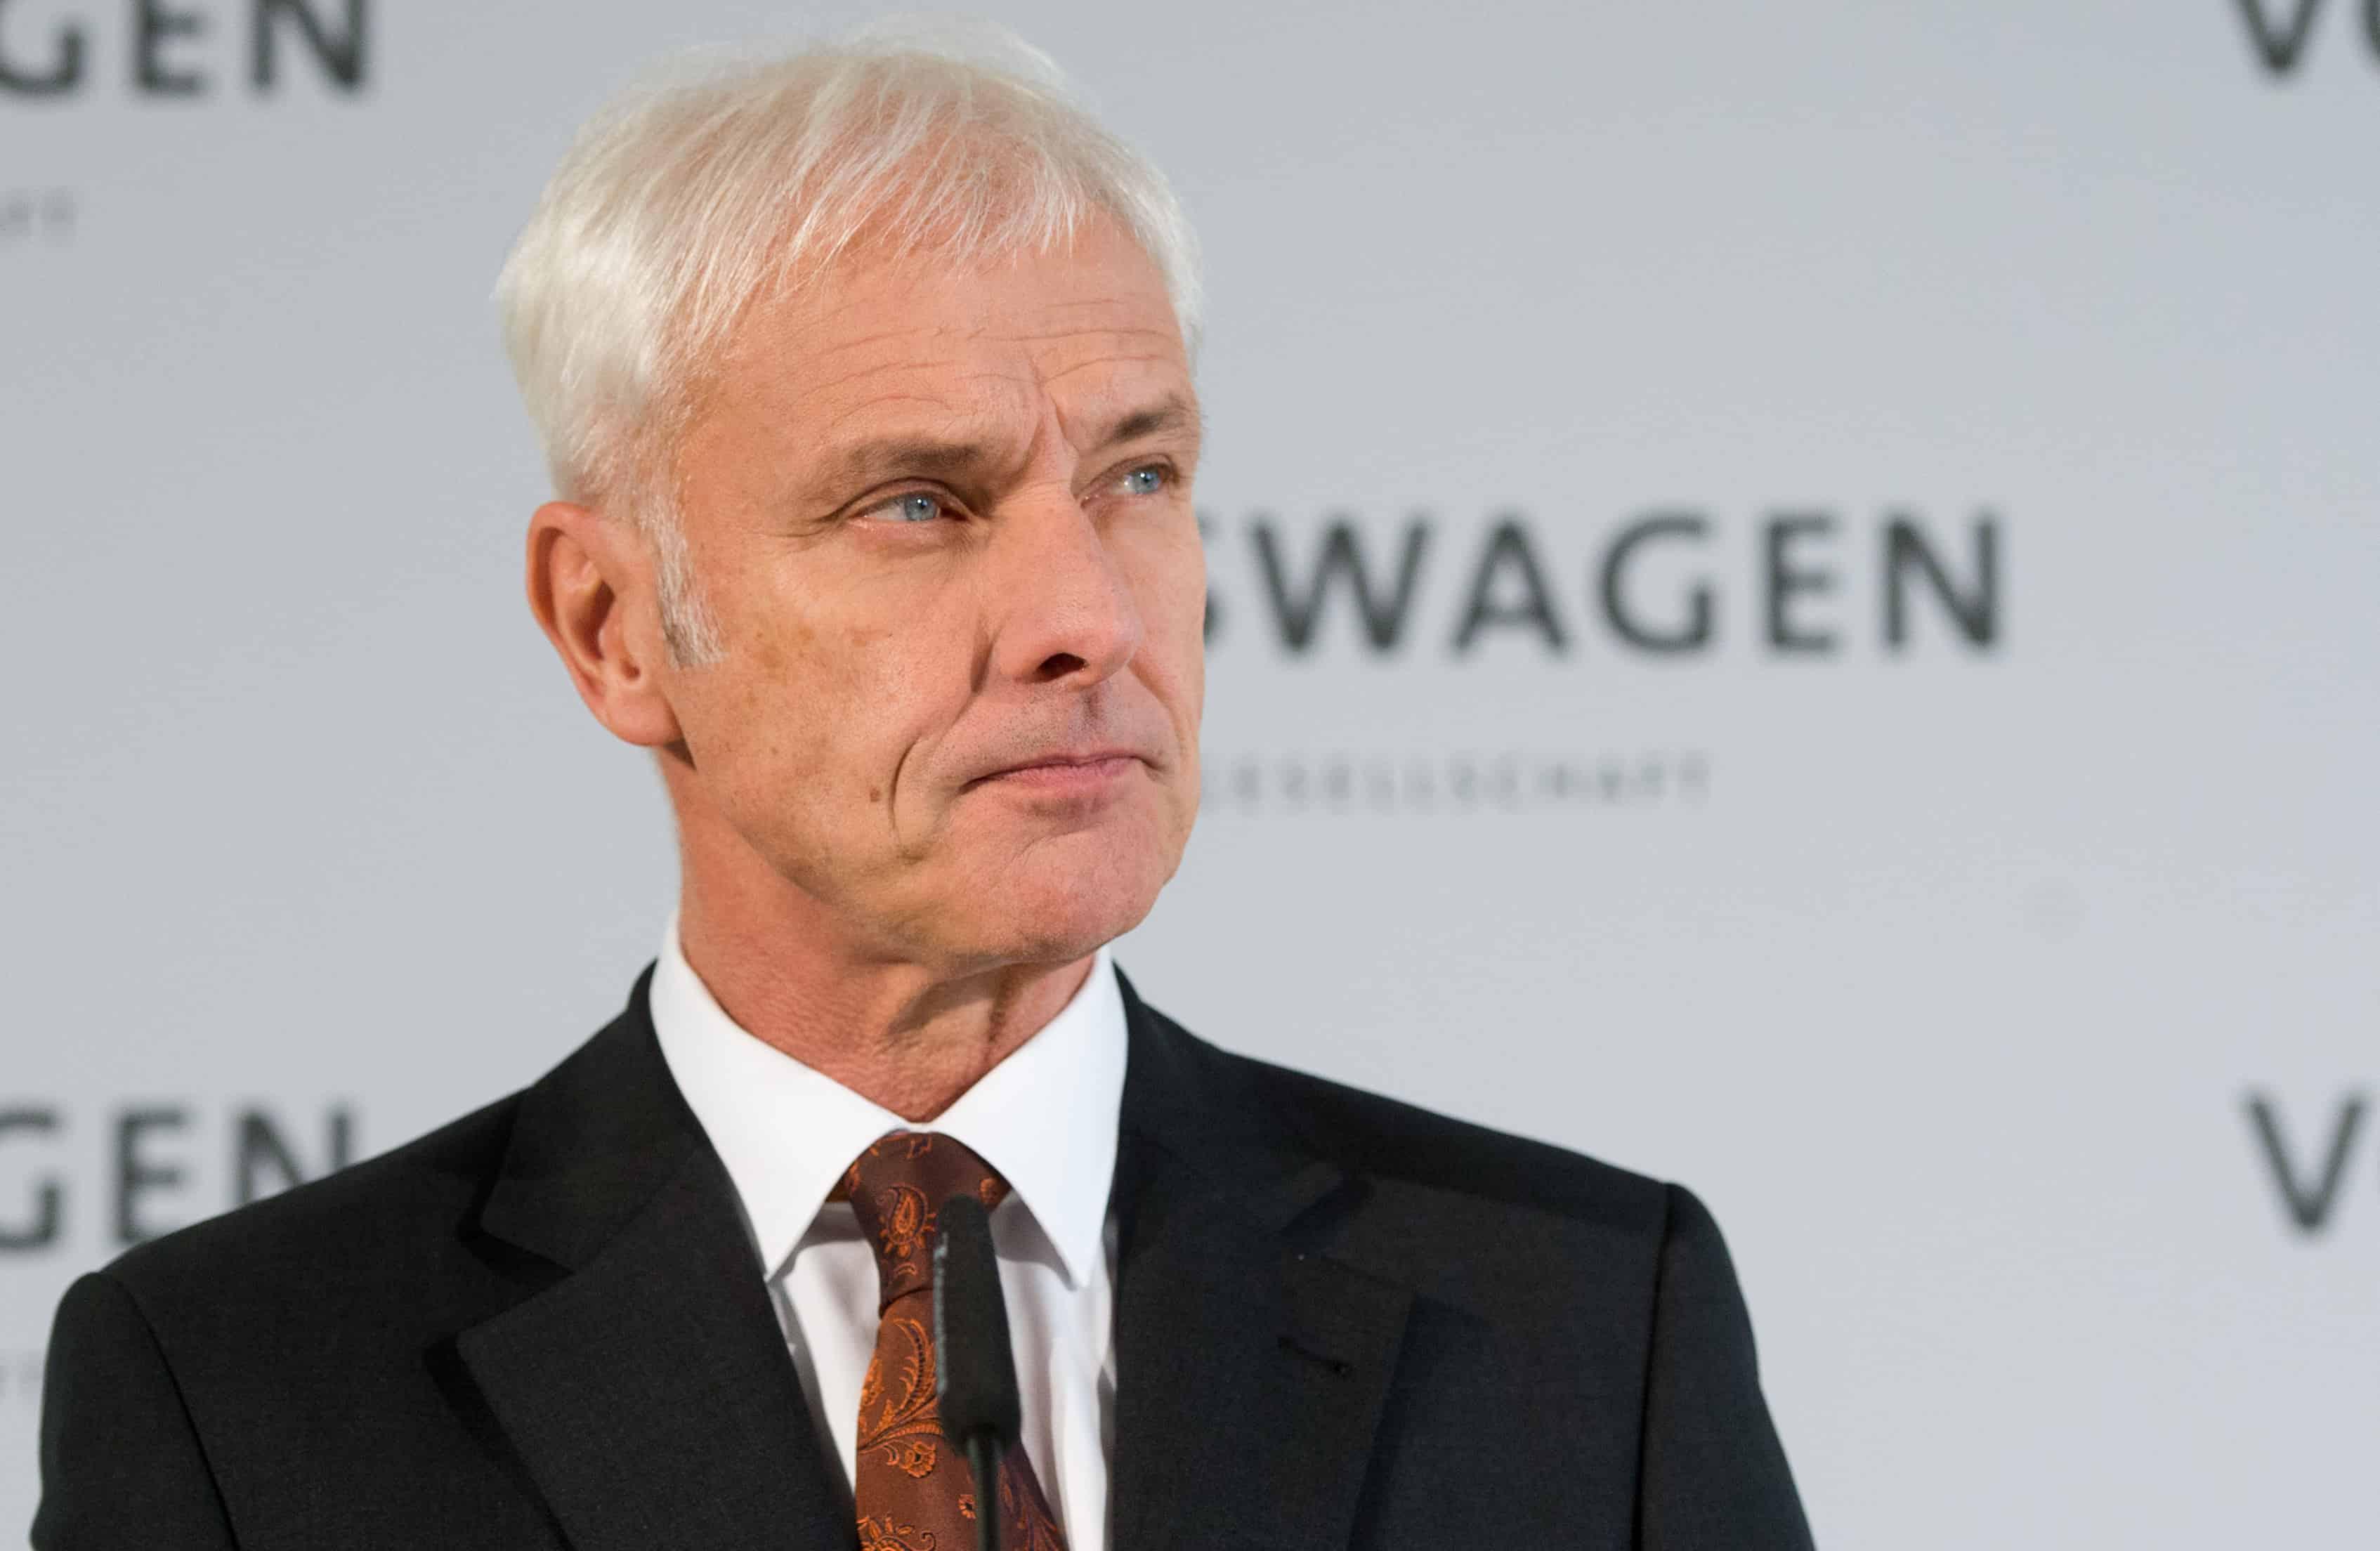 VW CEO Matthias Mueller